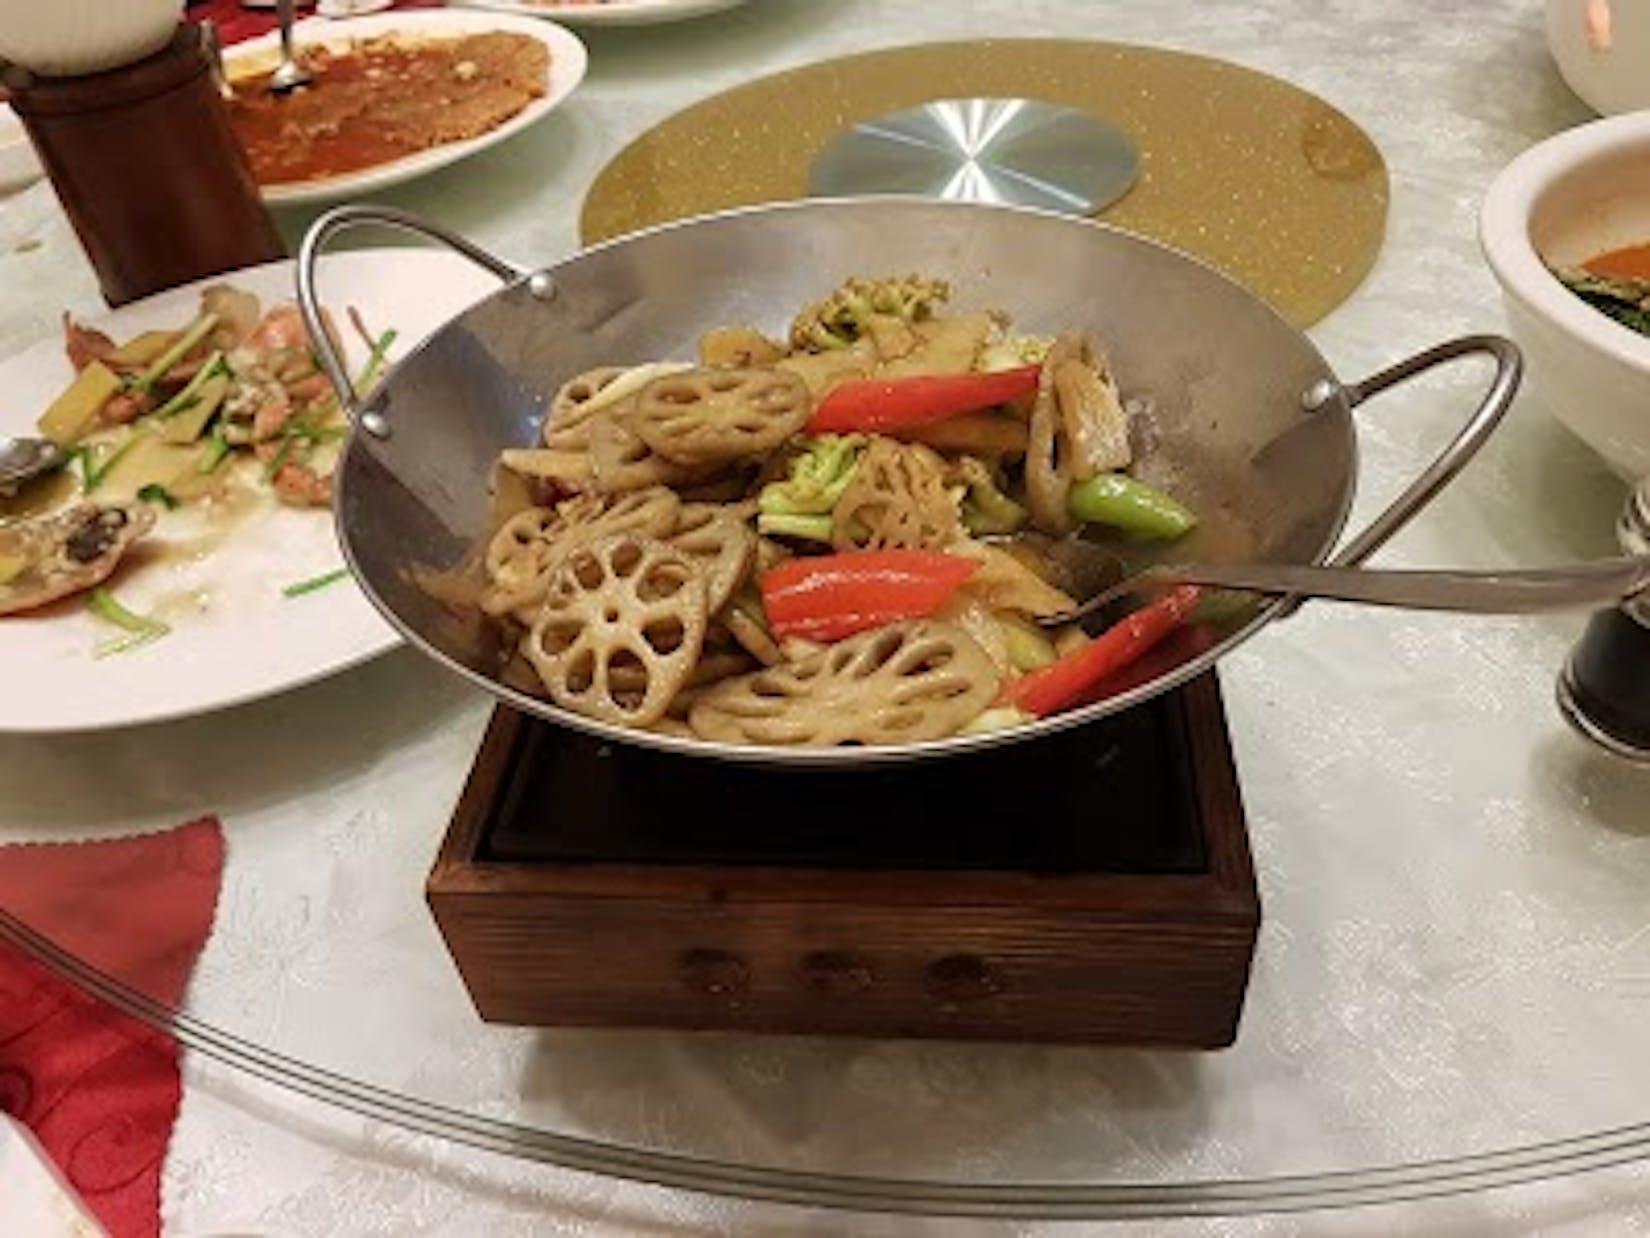 Furama Seafood Restaurant | yathar